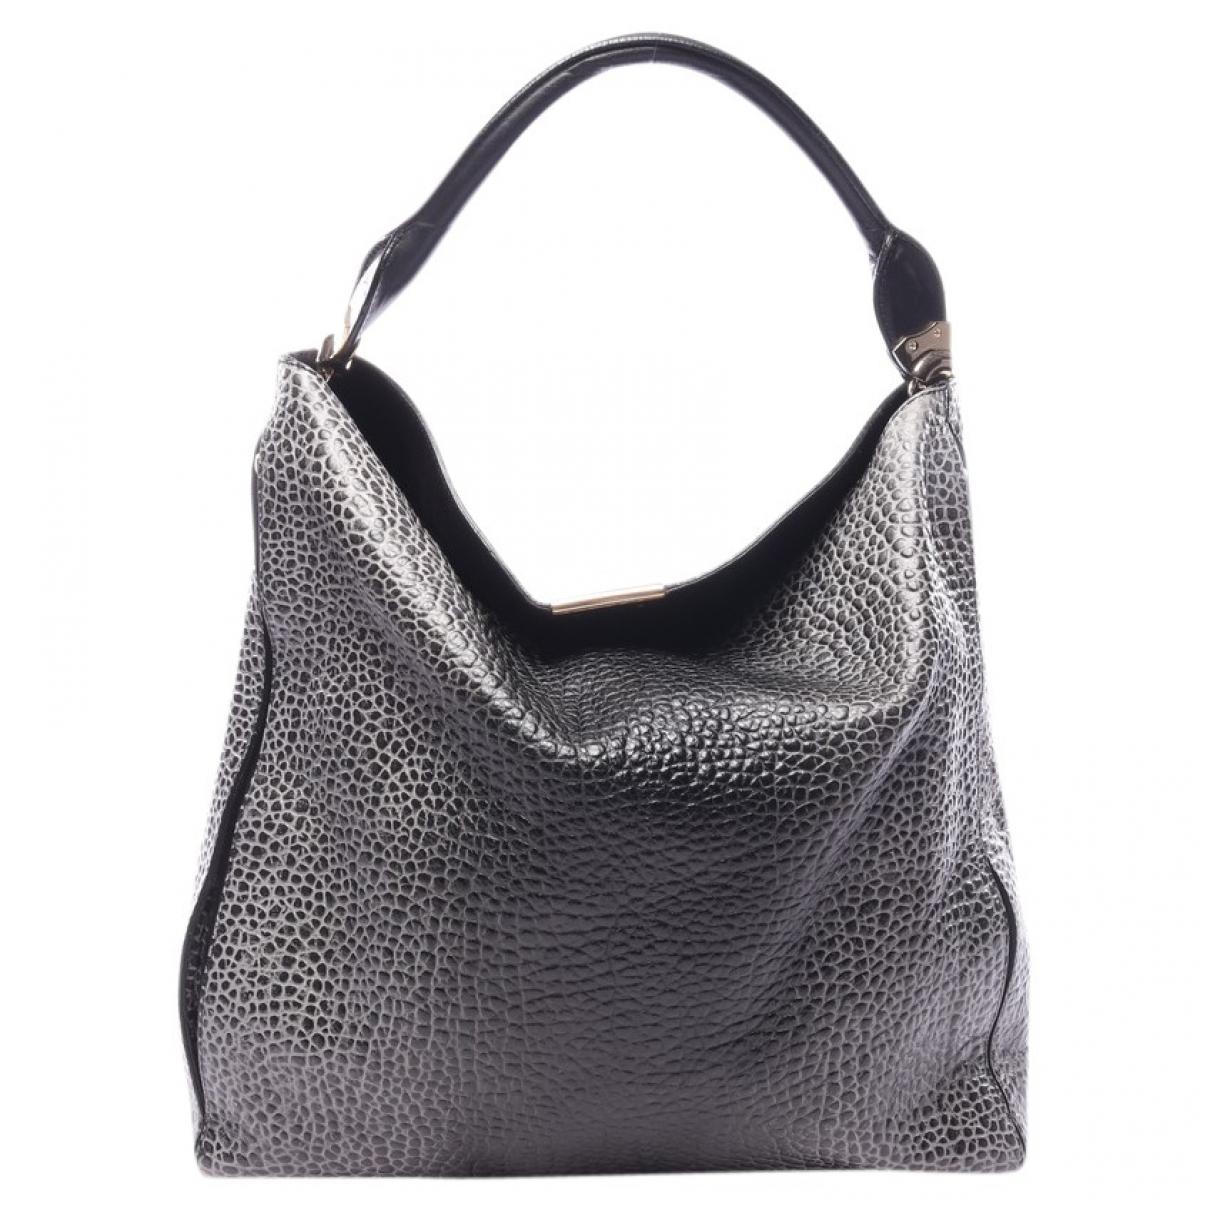 Burberry \N Handtasche in  Grau Leder